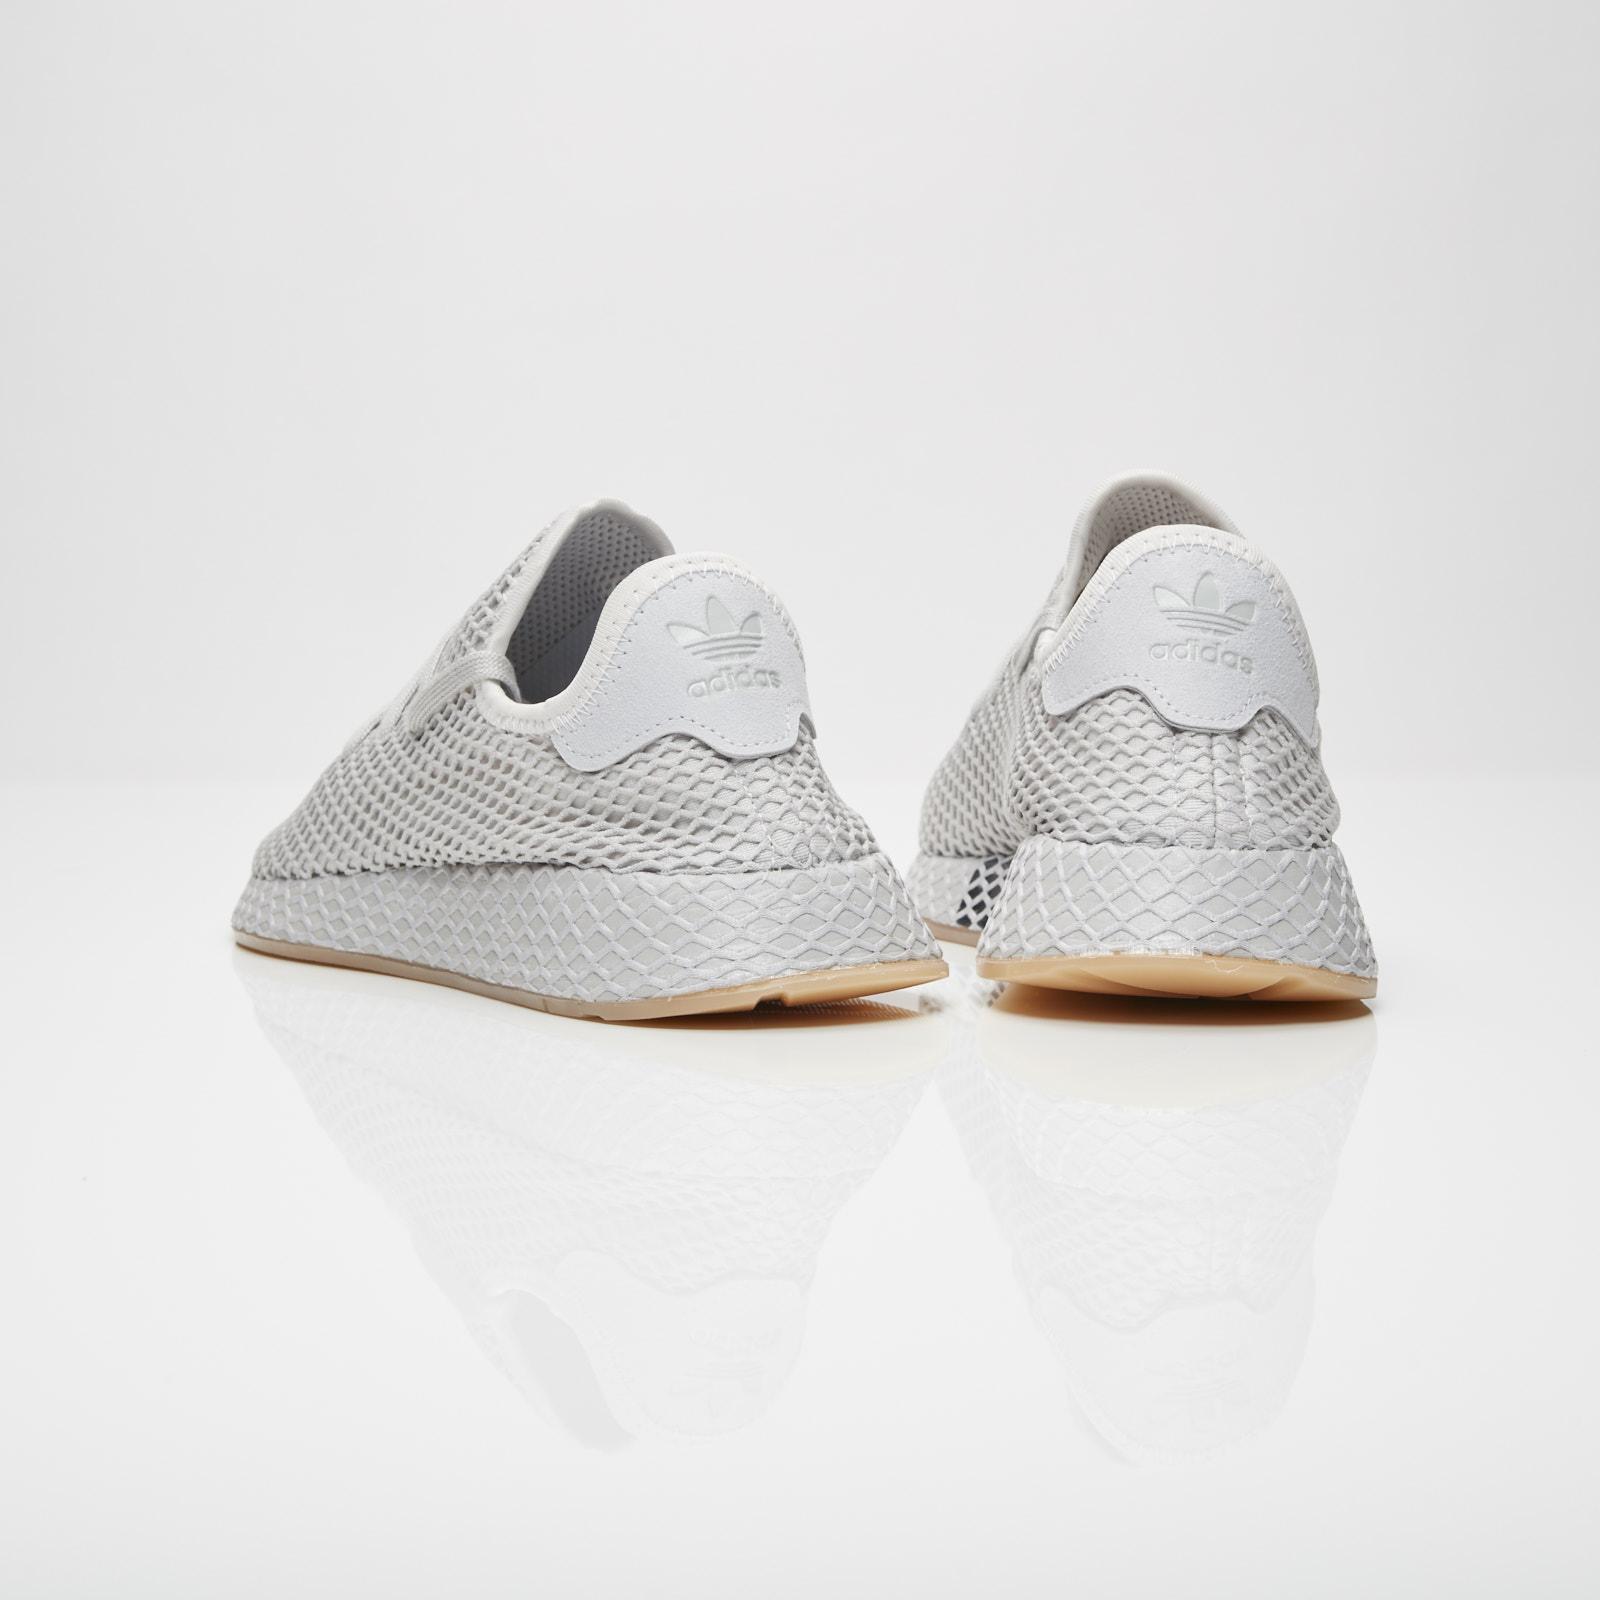 a79c2baa5 adidas Deerupt Runner - Cq2628 - Sneakersnstuff